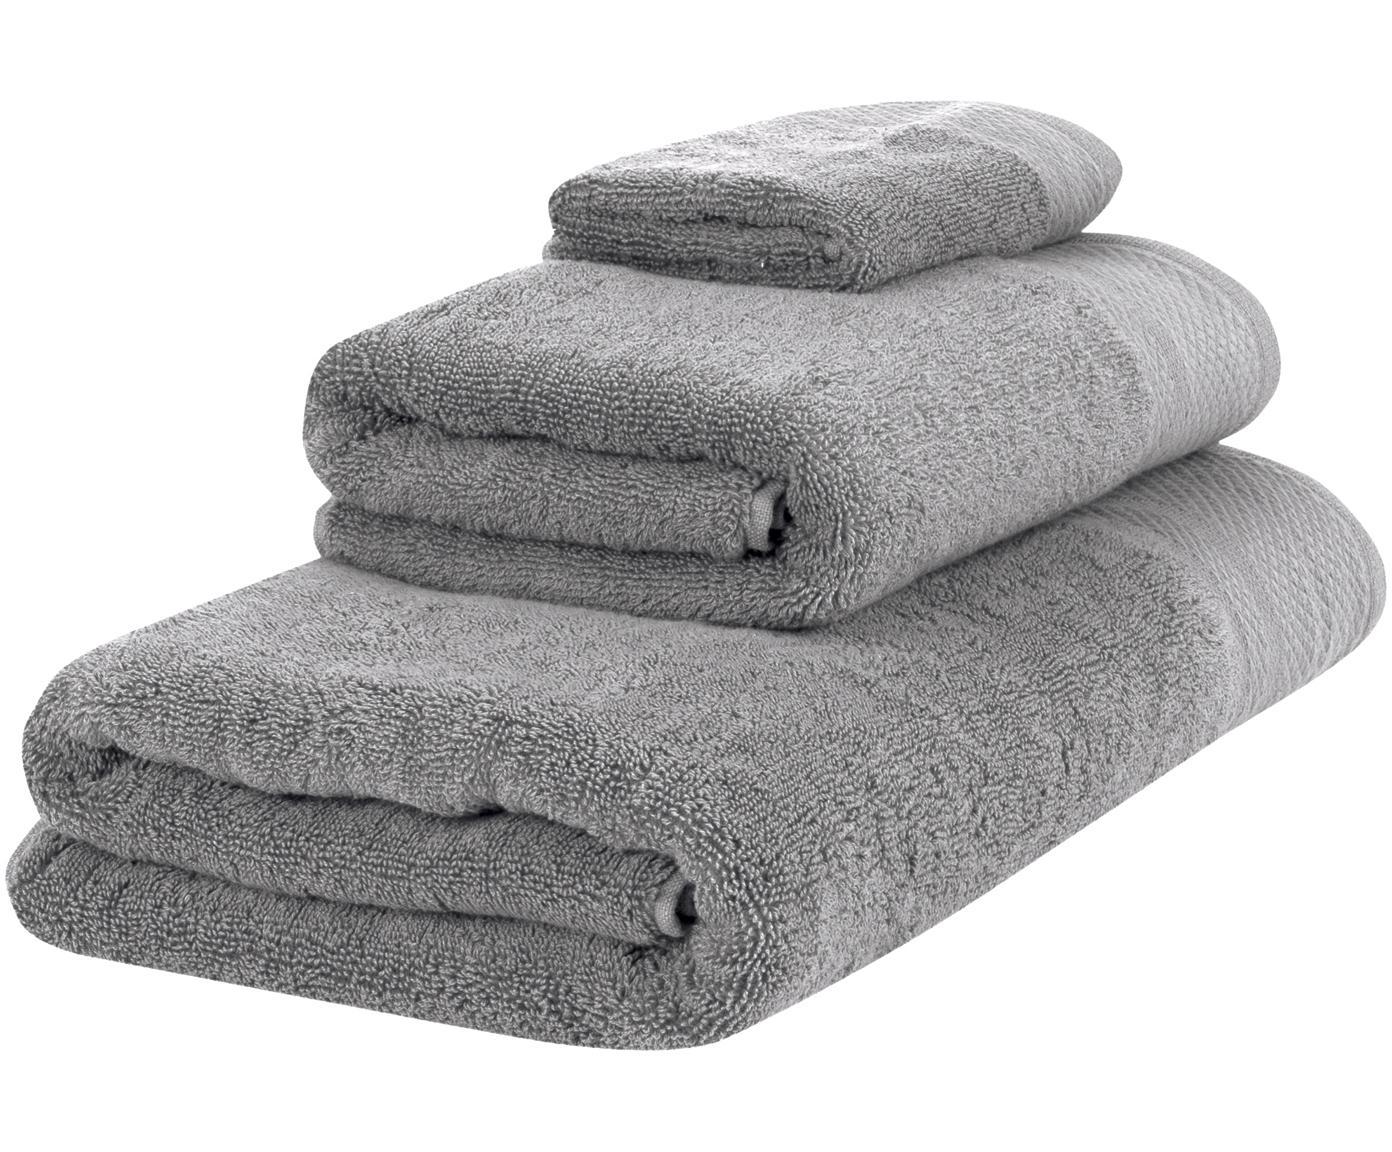 Set asciugamani Premium, 3 pz., 100% cotone, qualità pesante 600g/m², Grigio scuro, Diverse dimensioni